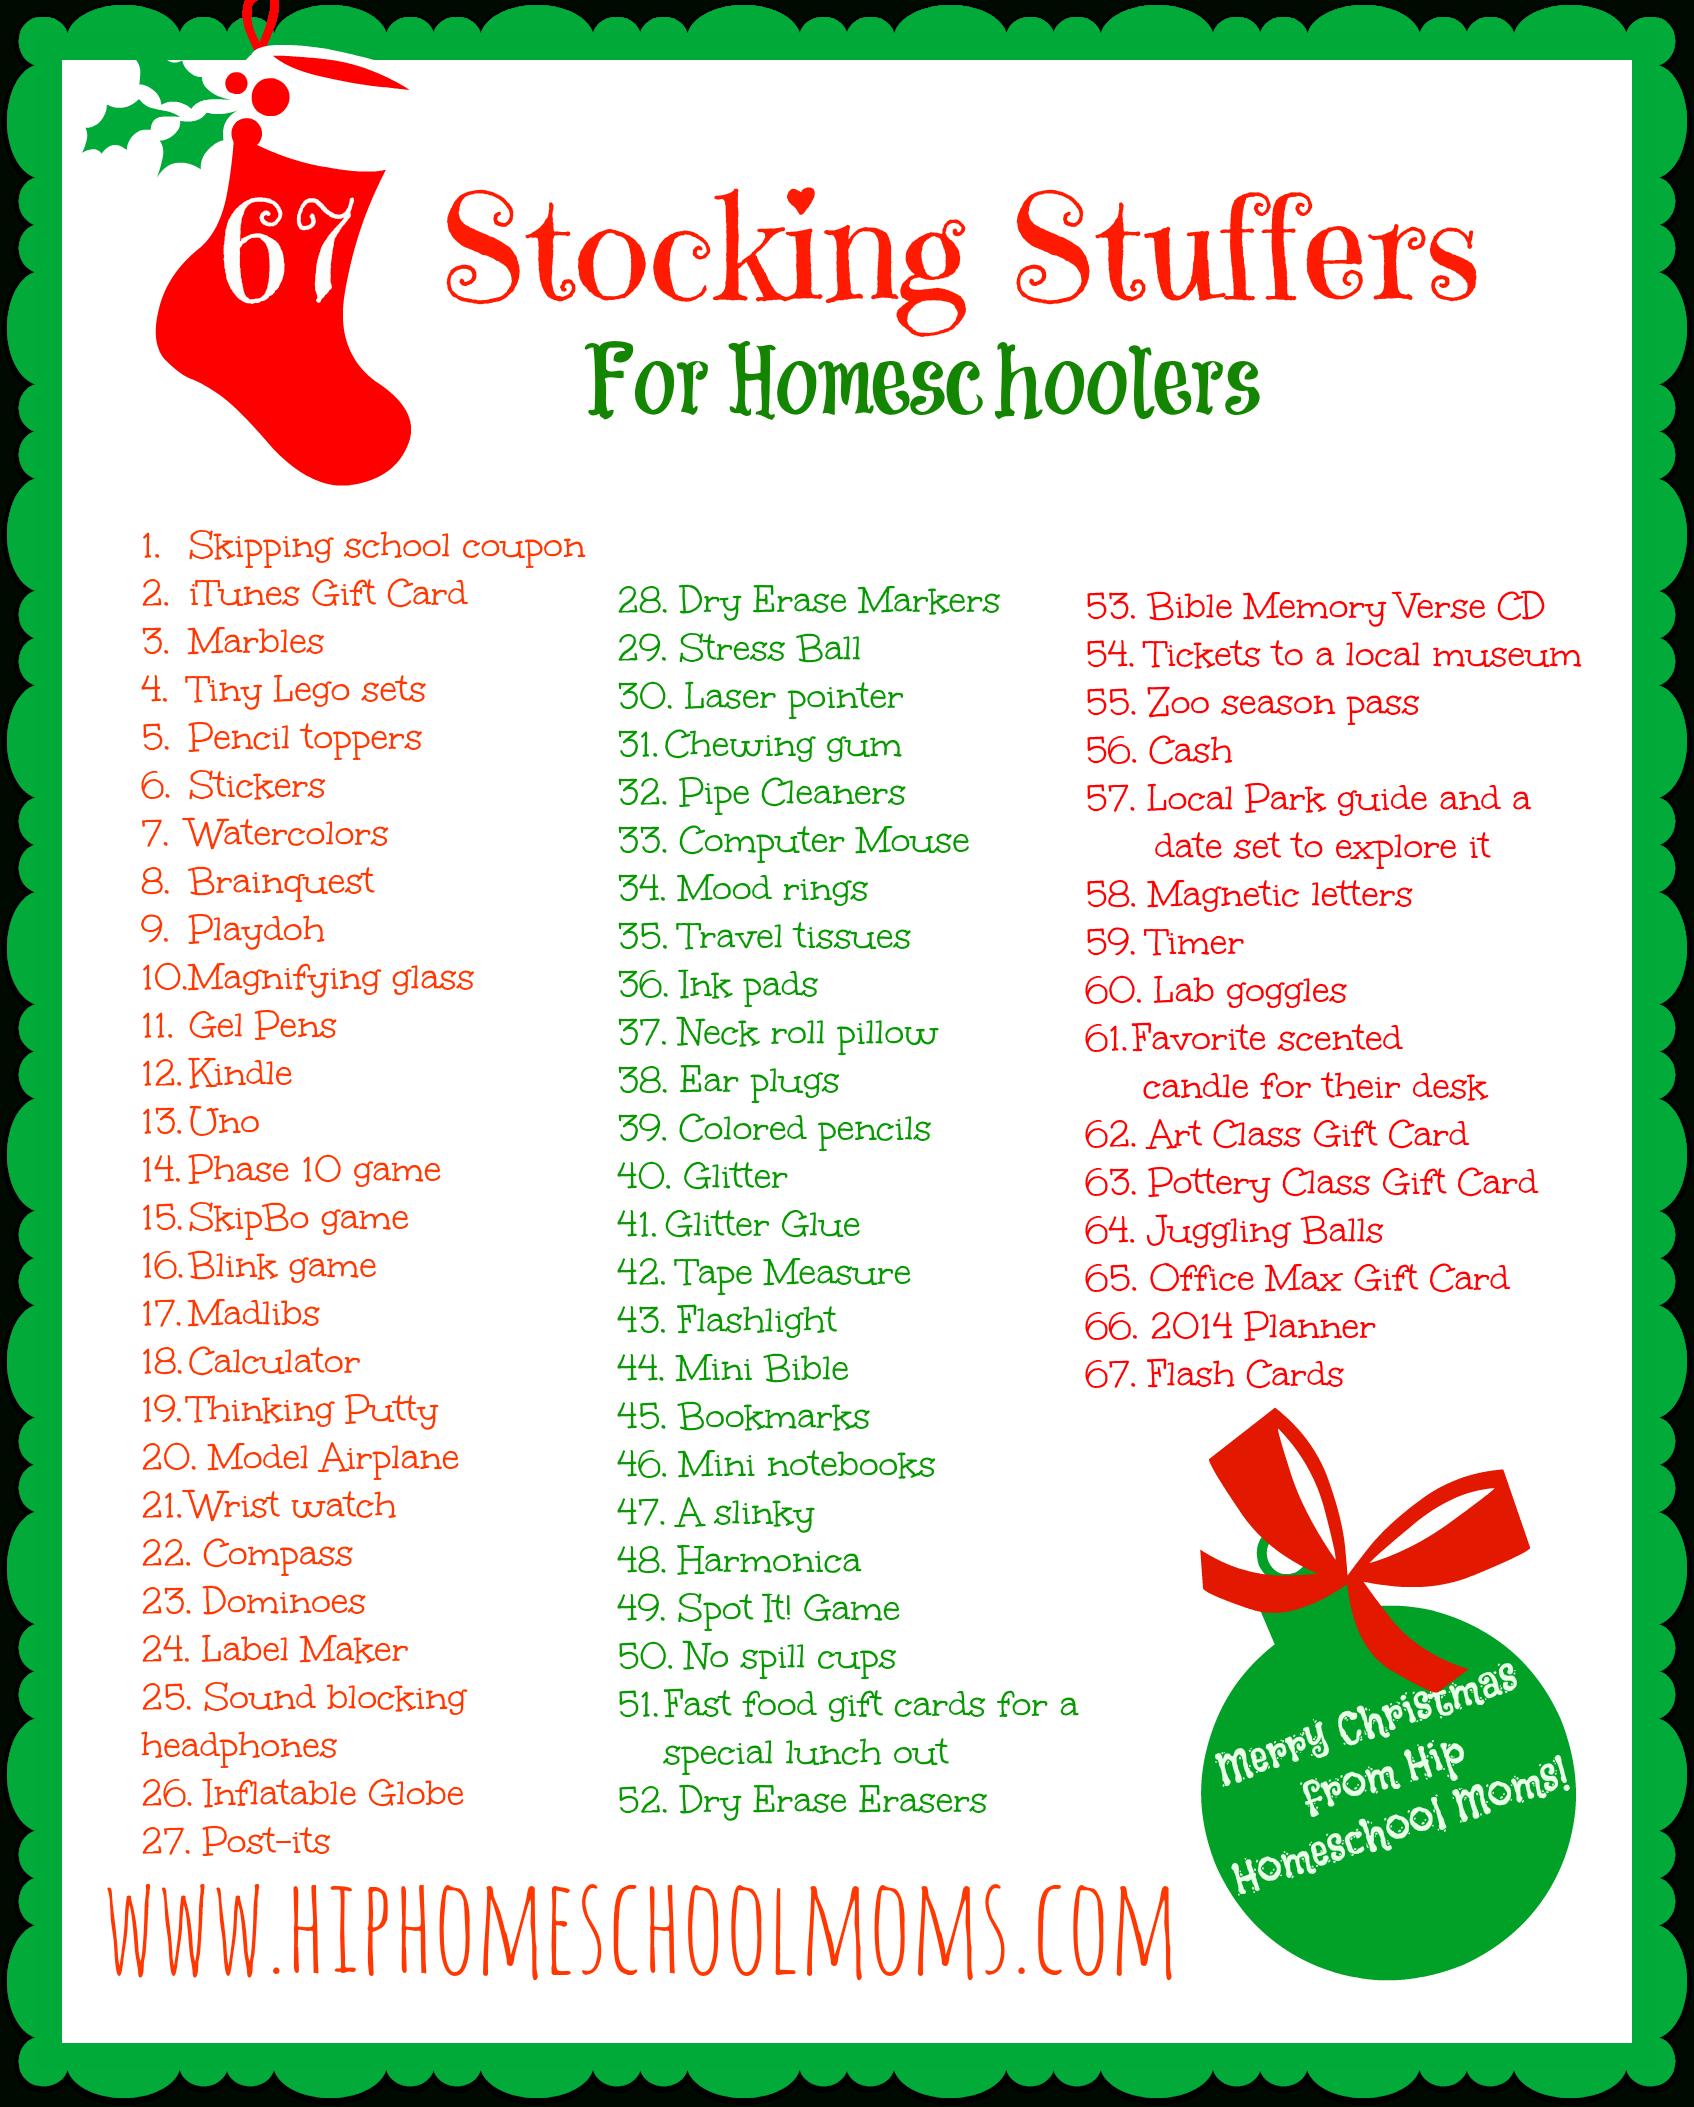 Printable Homeschool Stocking Stuffer Ideas | Hip Homeschool Moms - Free Printable Stocking Stuffers